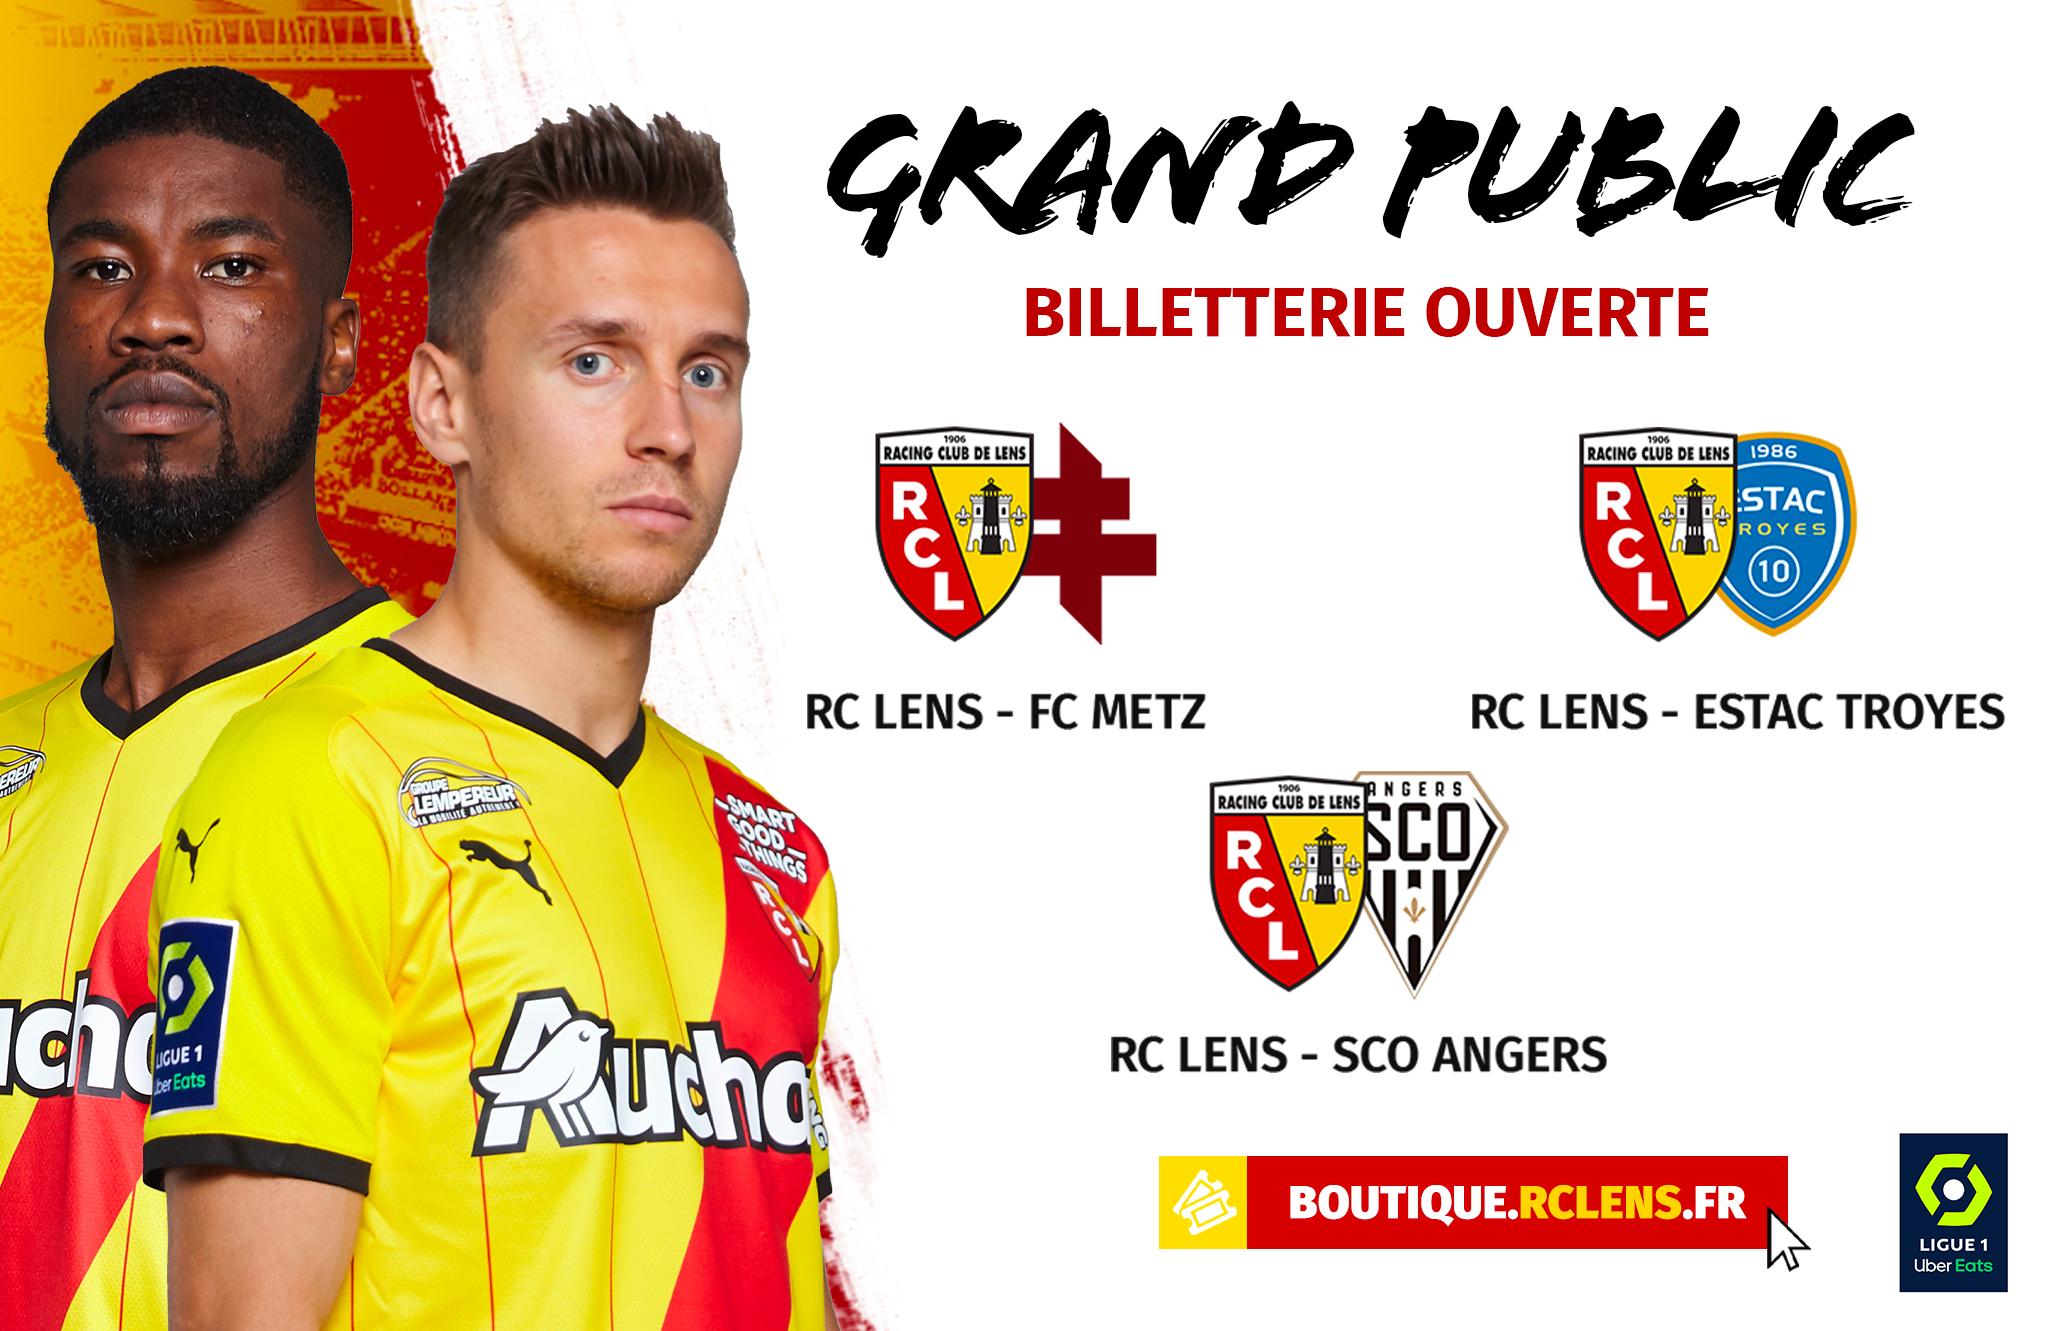 Metz, Troyes, Angers : la billetterie ouverte